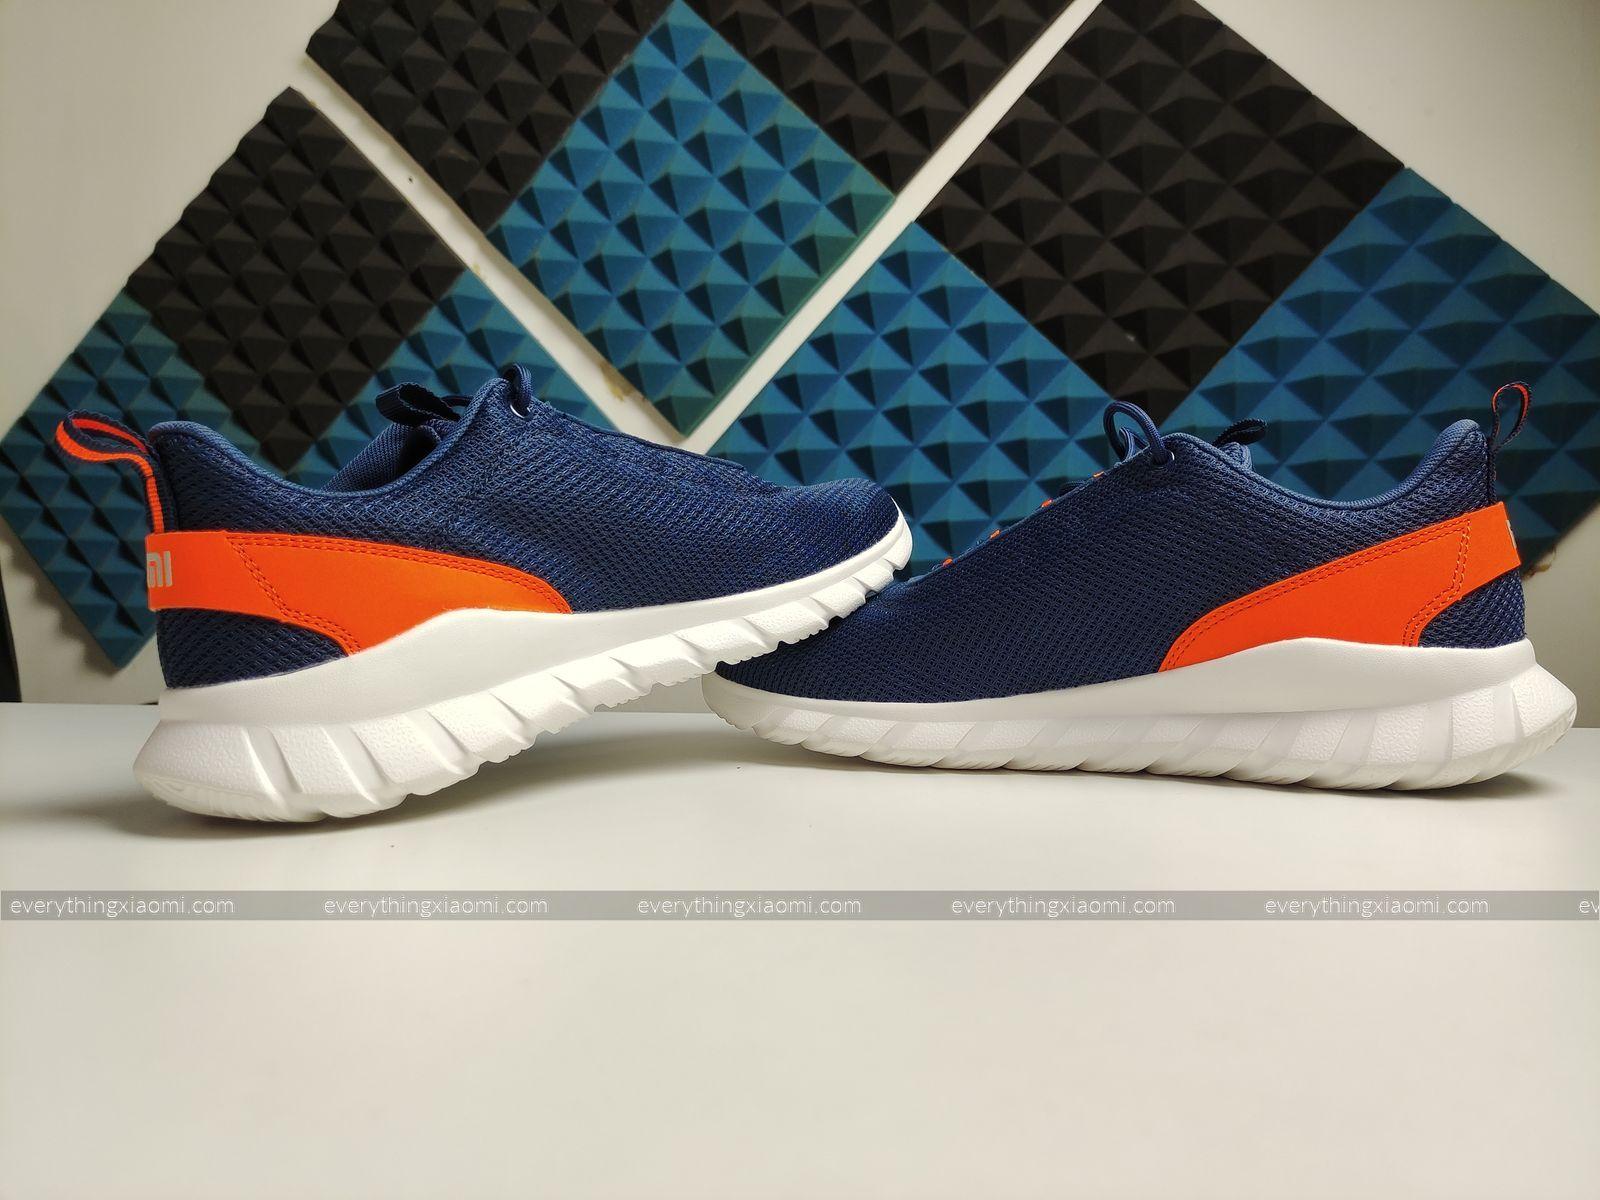 MI Athleisure shoes 1 result